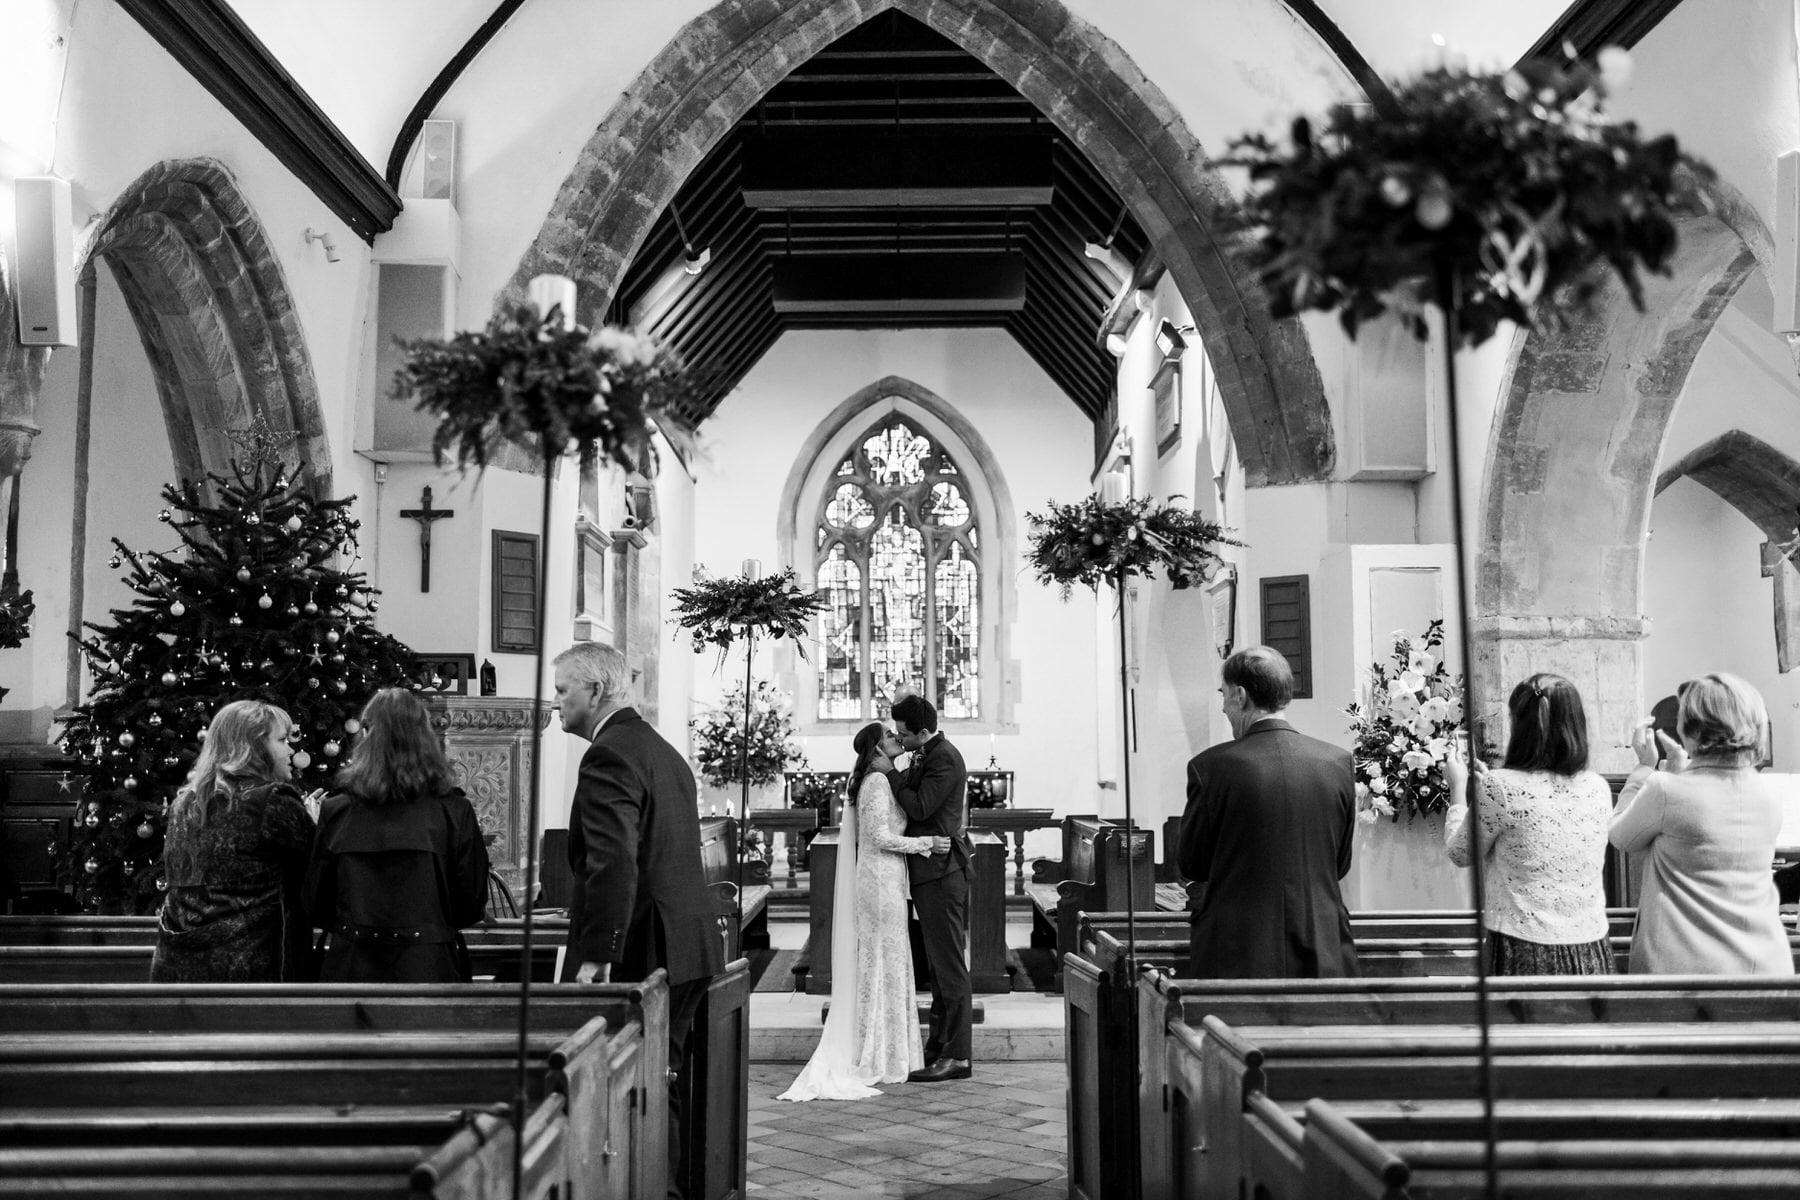 New forest church wedding photographer